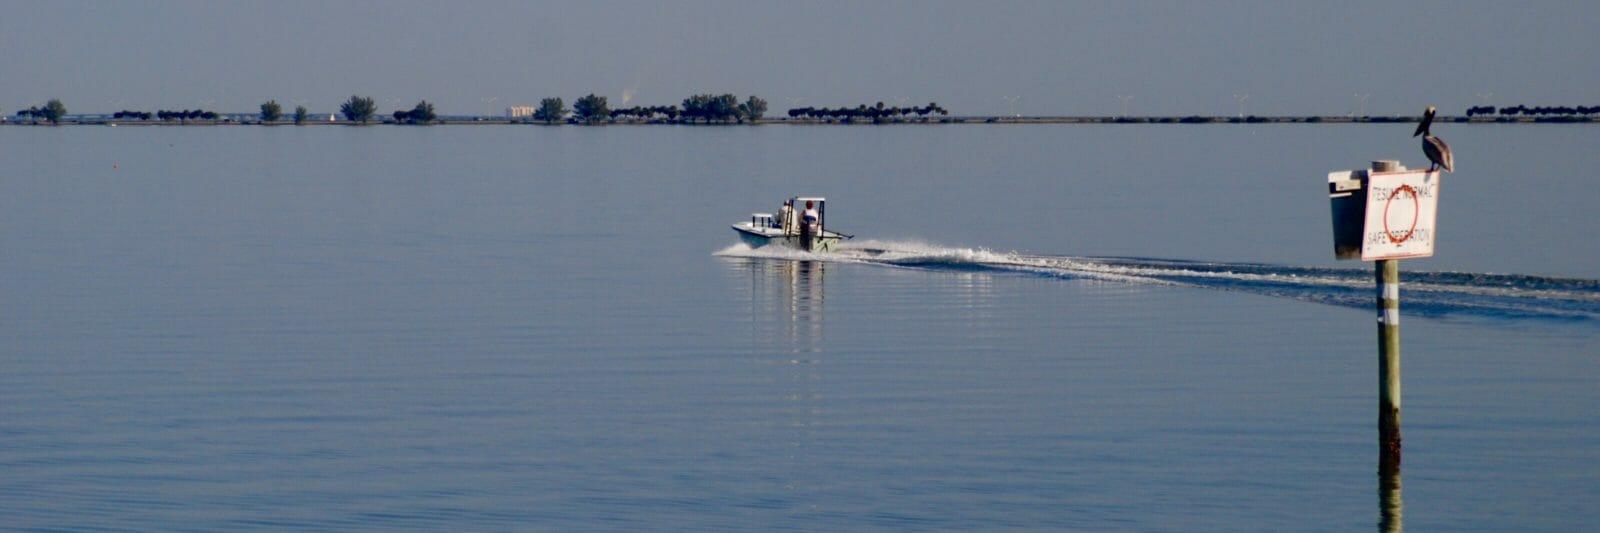 Boater on Safety Harbor